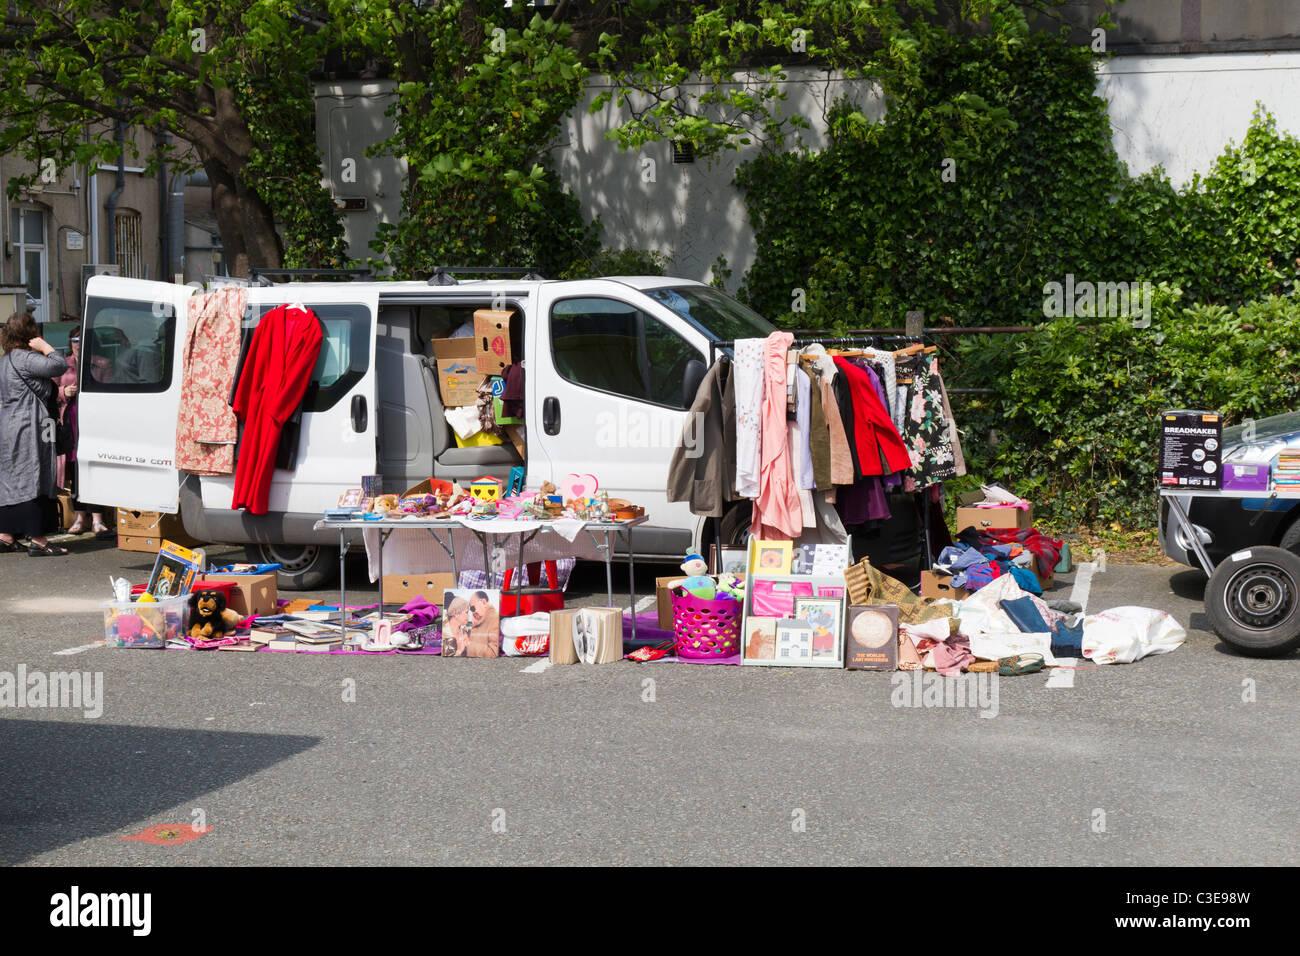 Car boot sale on a car park stock image